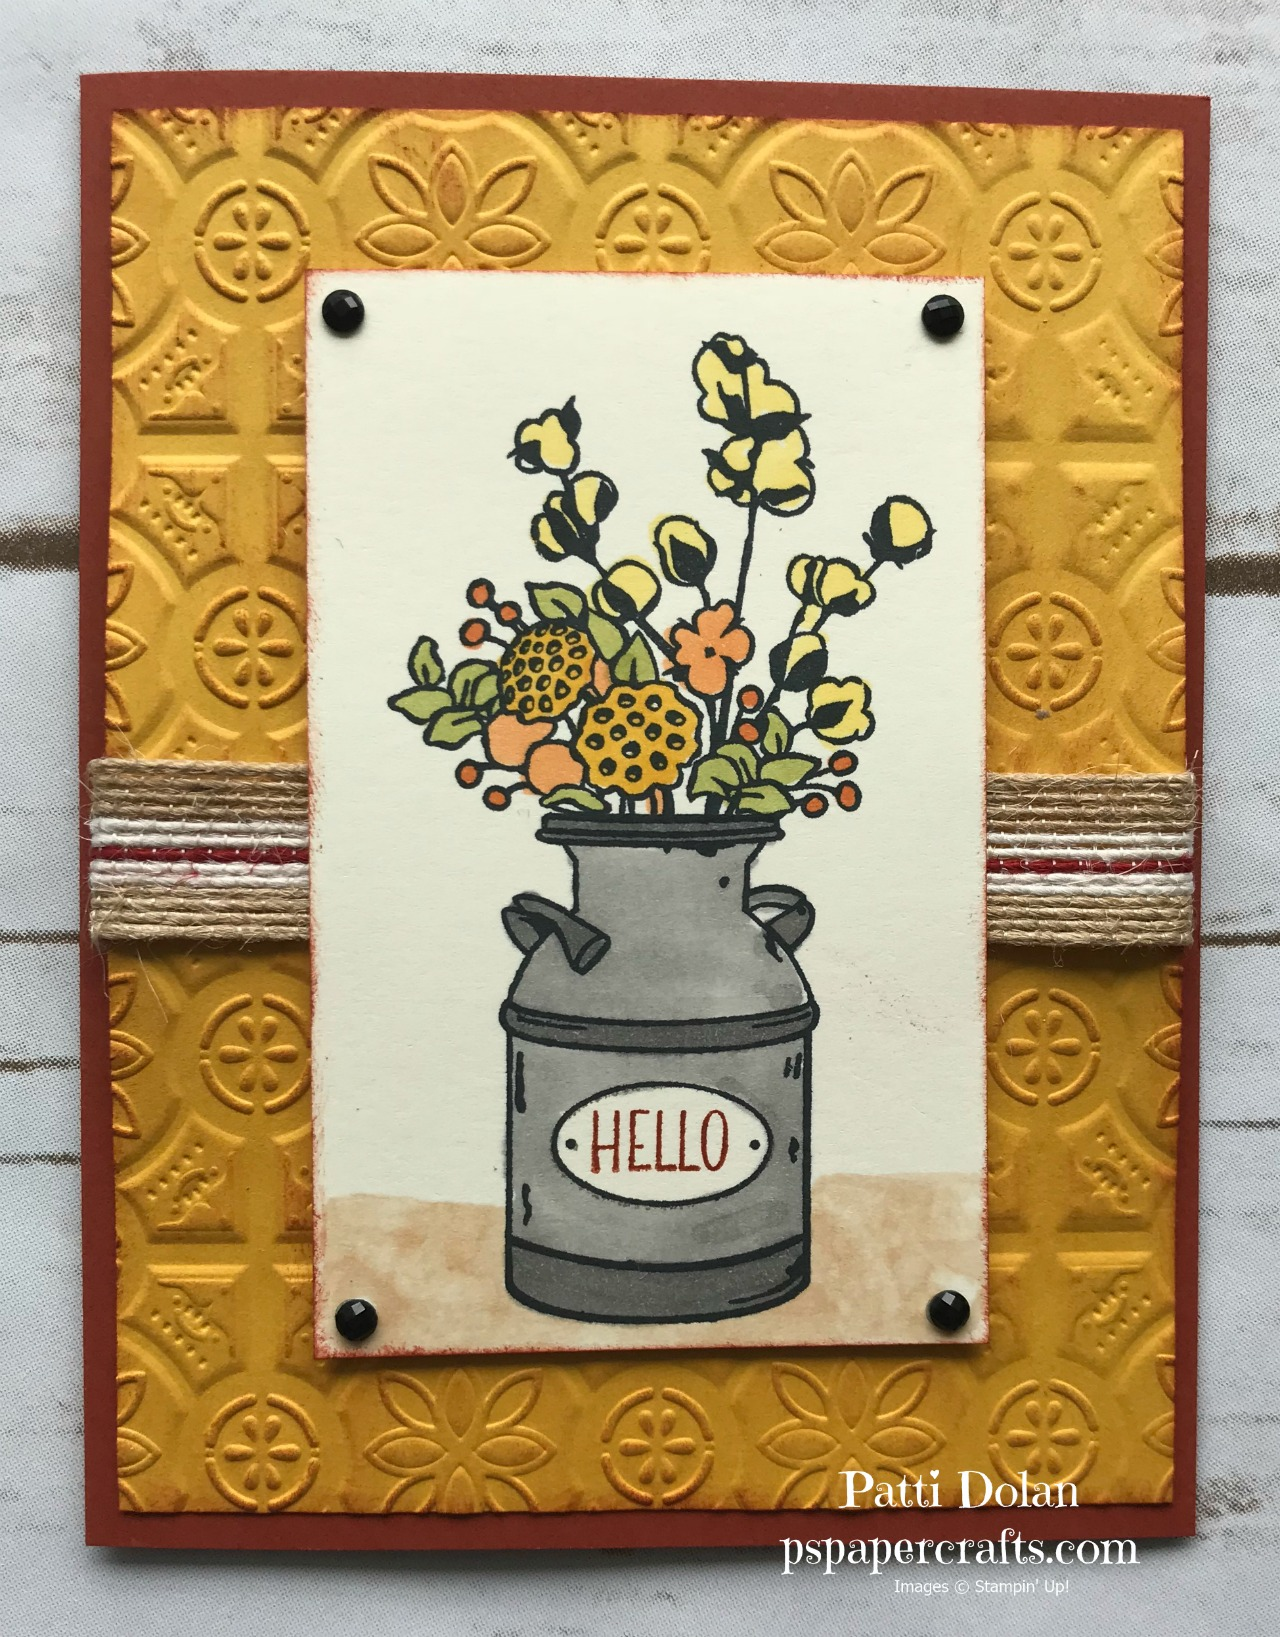 Country Home Tin Tile Orange Small.jpg